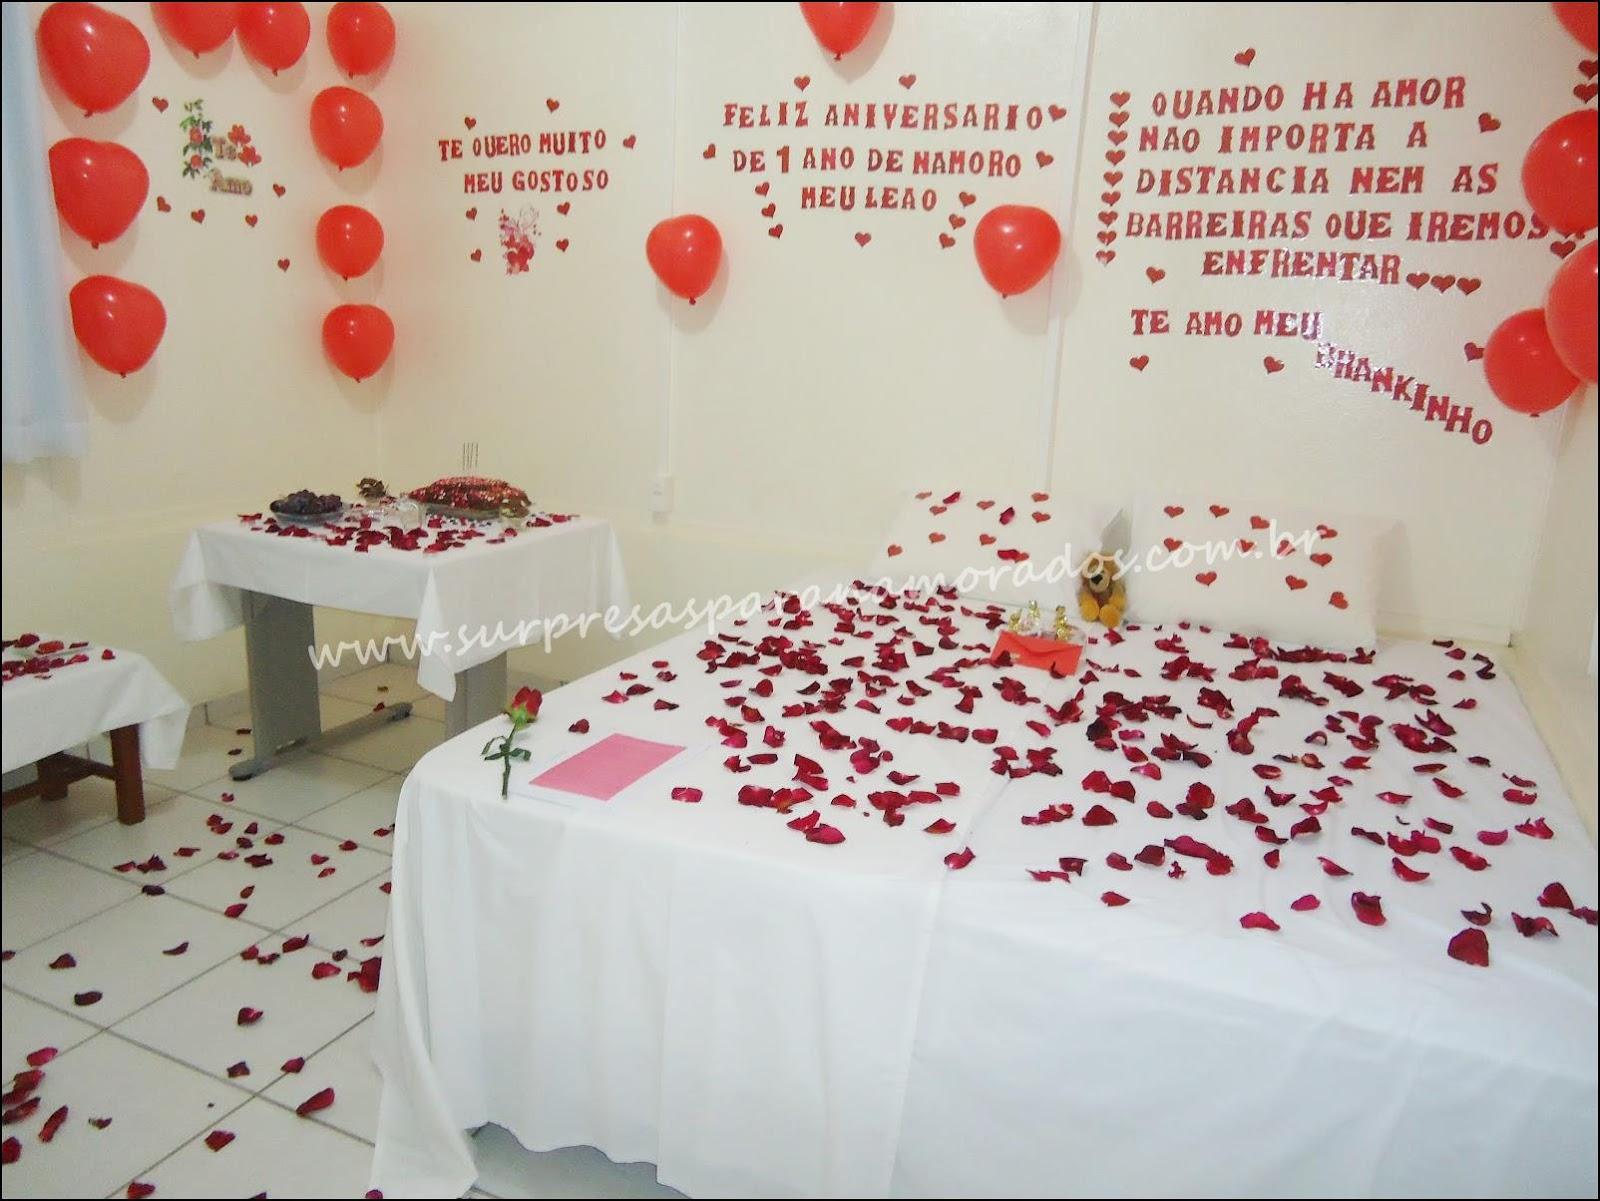 Mensagem Romântica Para O Namorado: Surpresas Para Namorados